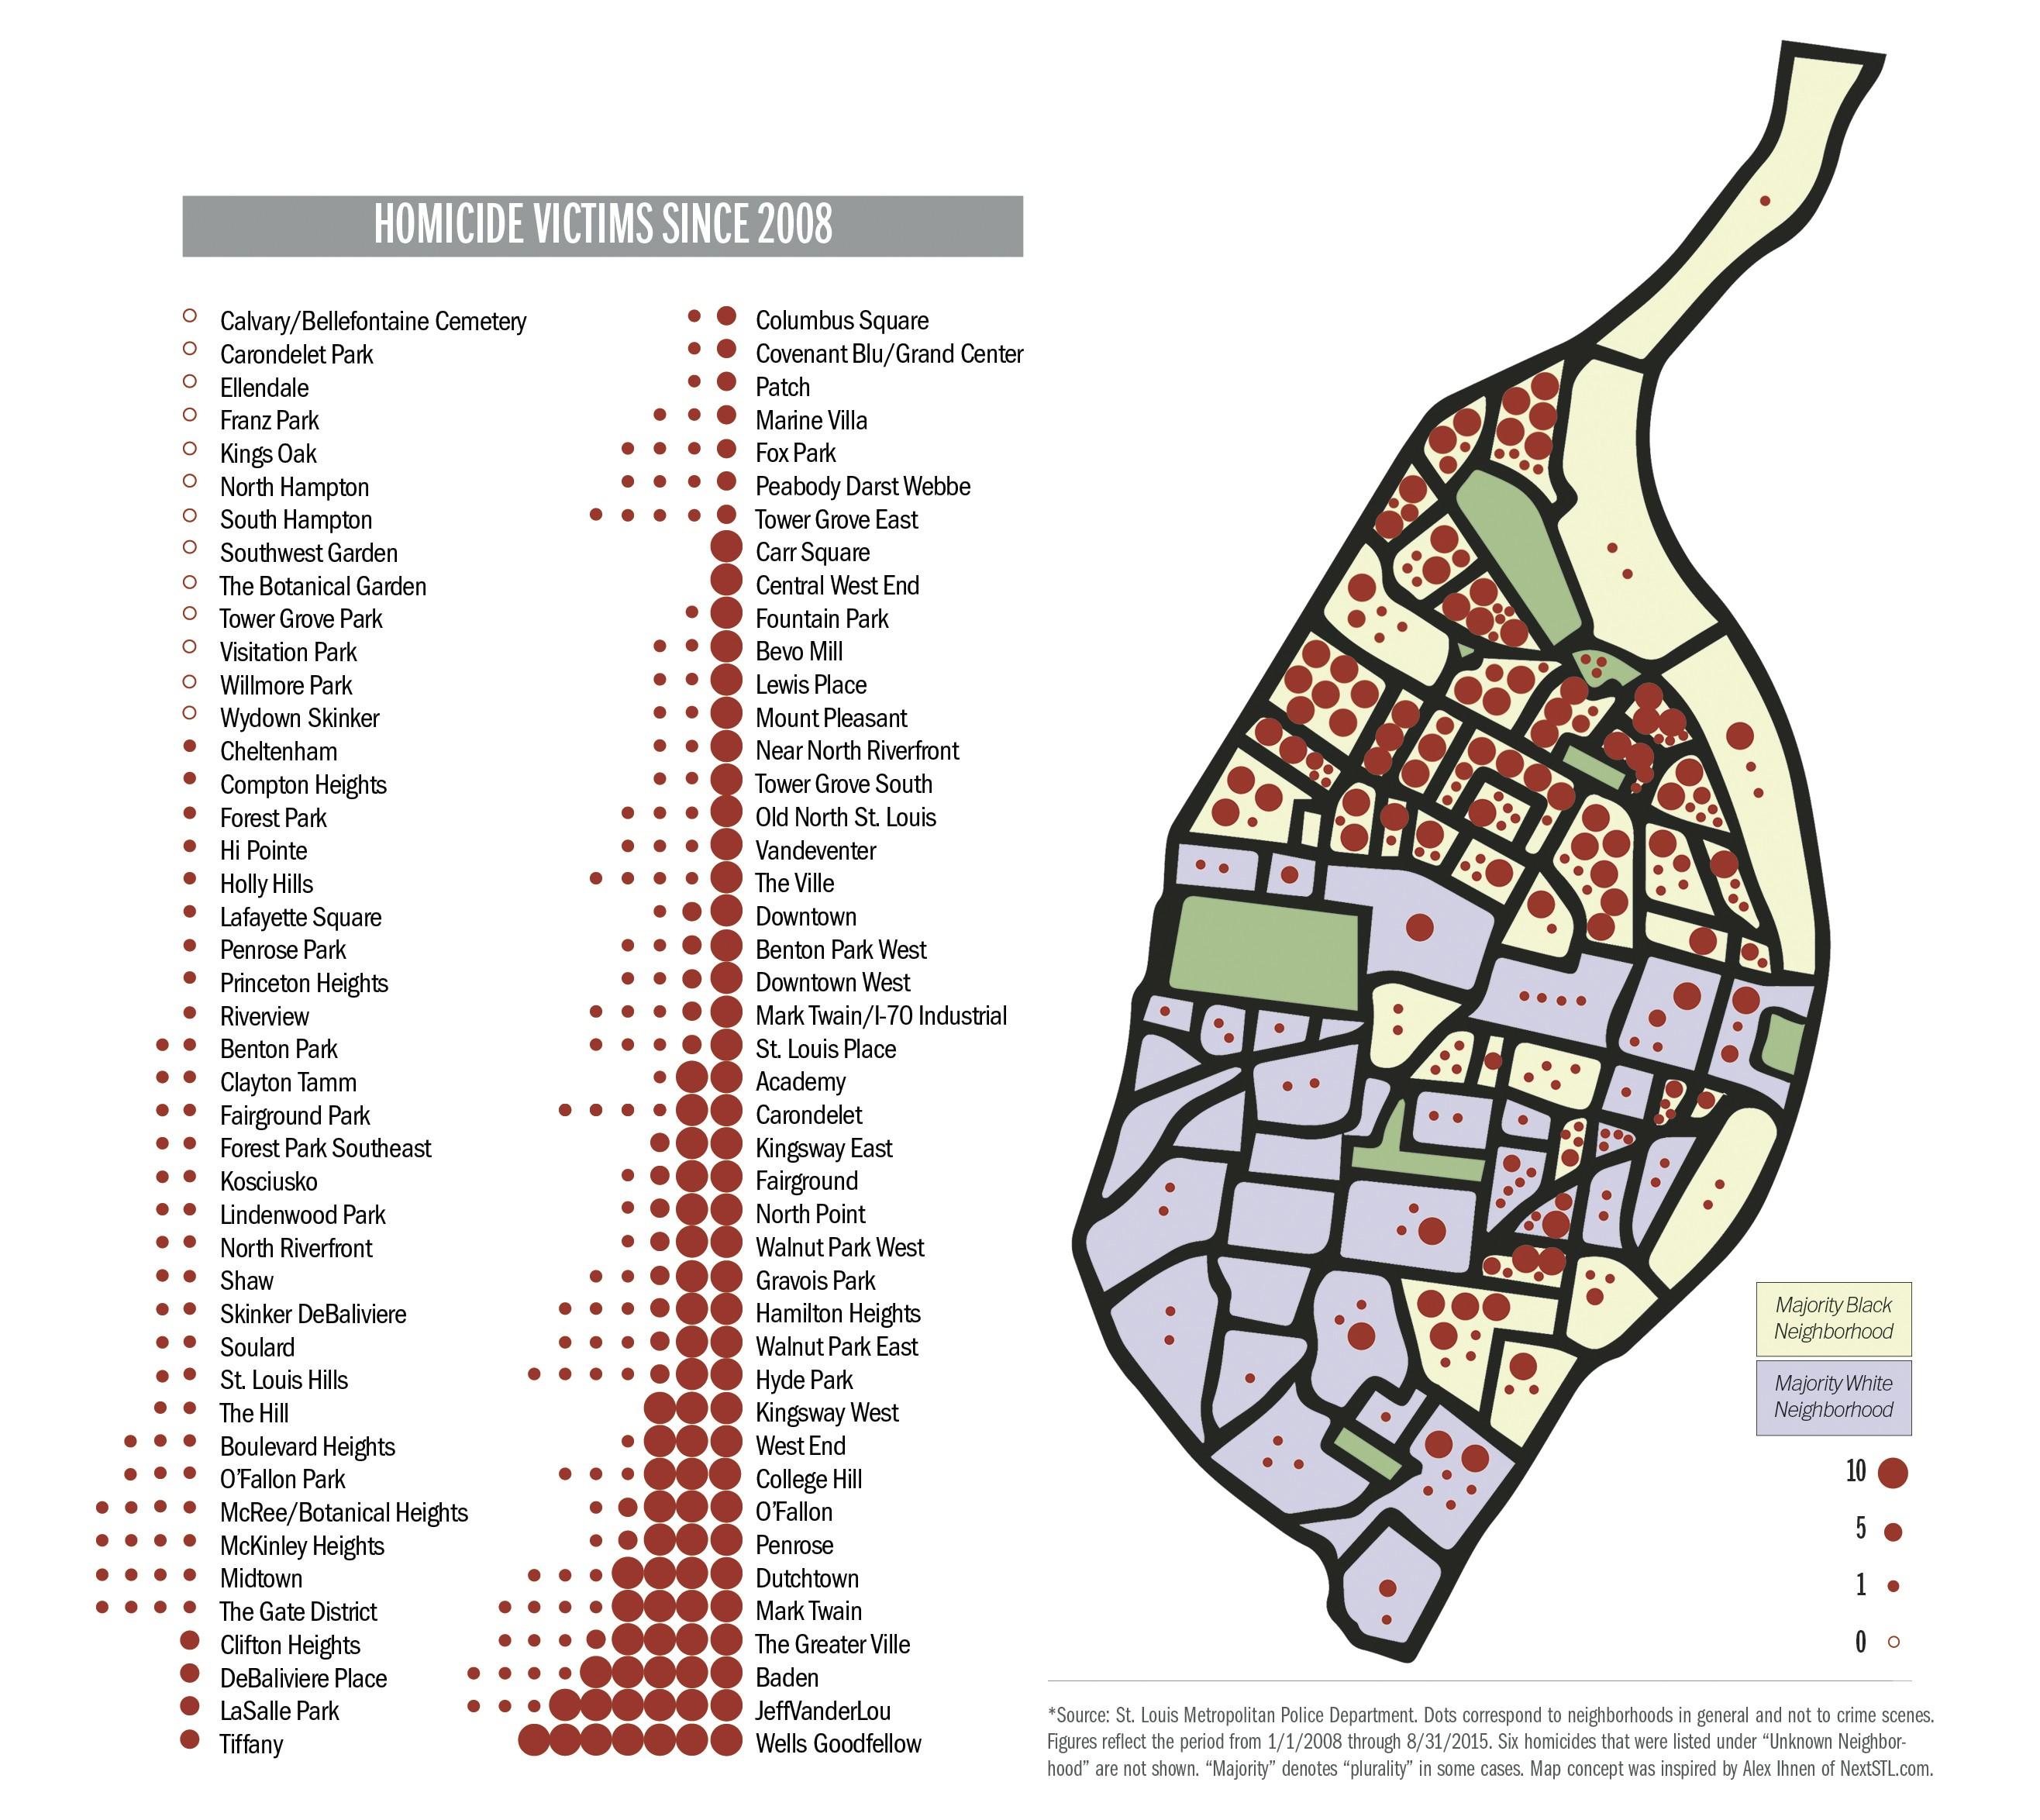 St. Louis Murder Map Tracks Killing by Neighborhood | News Blog